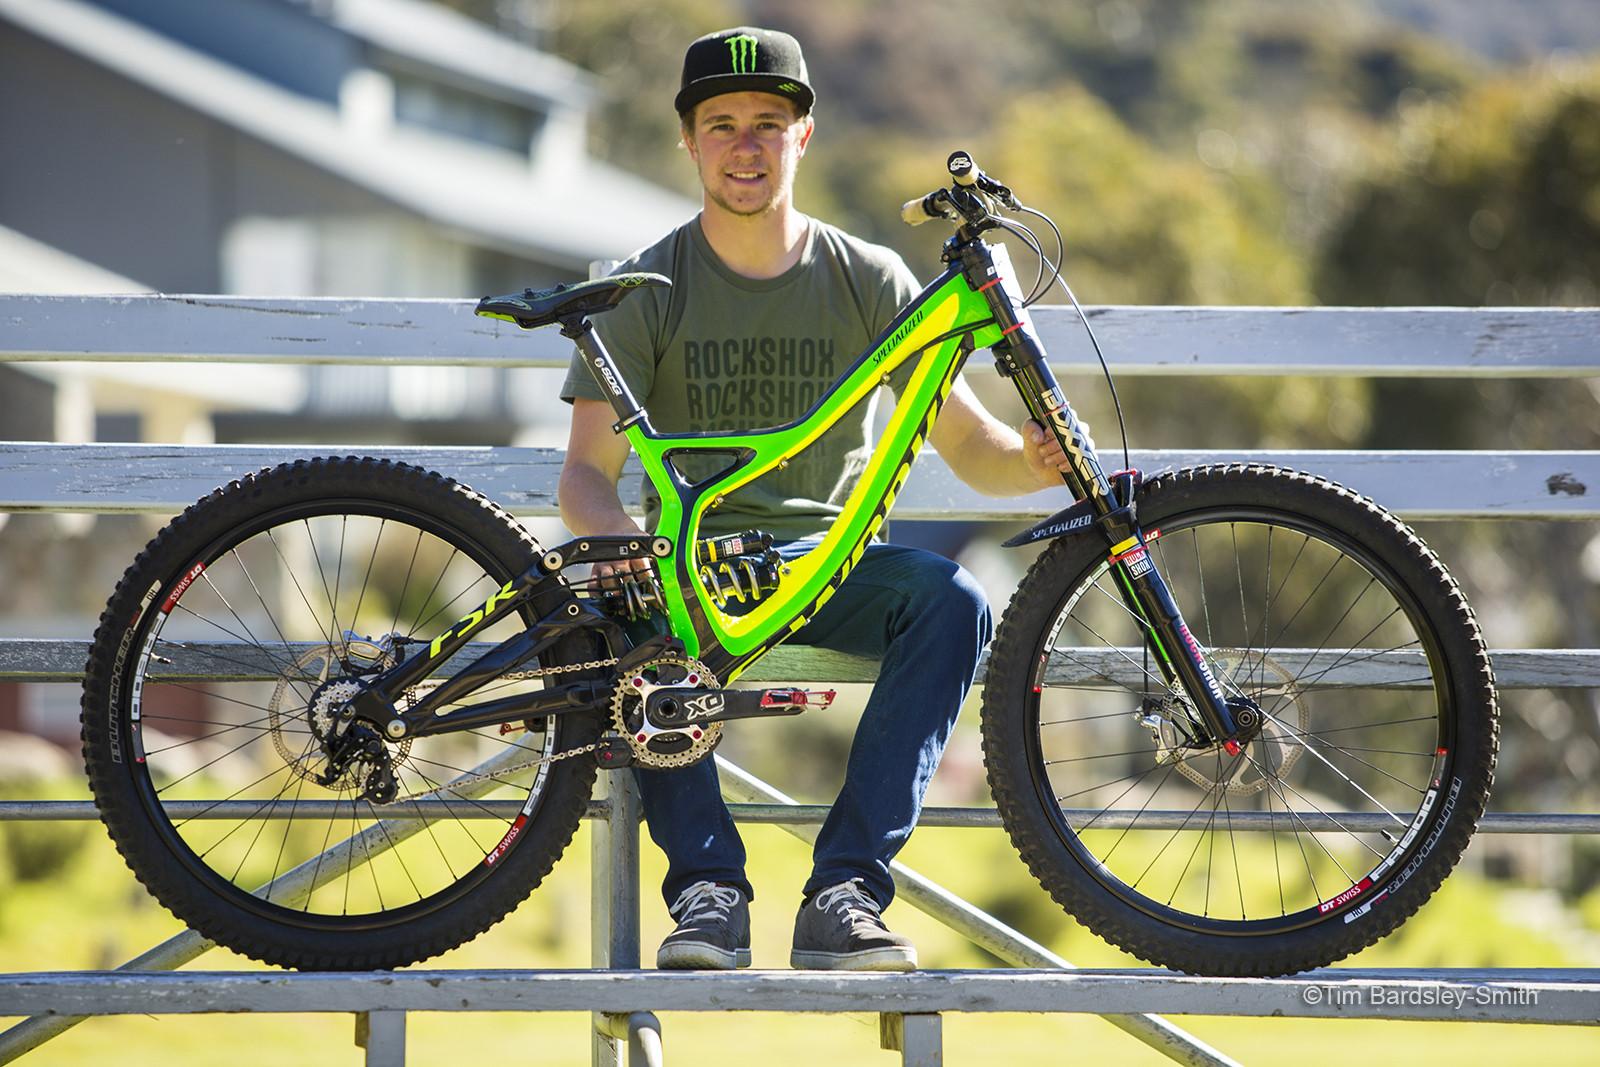 Pro Bike Check: Troy Brosnan's Specialized Demo 8 - Pro Bike Check: Troy Brosnan's Specialized Demo 8 - Mountain Biking Pictures - Vital MTB